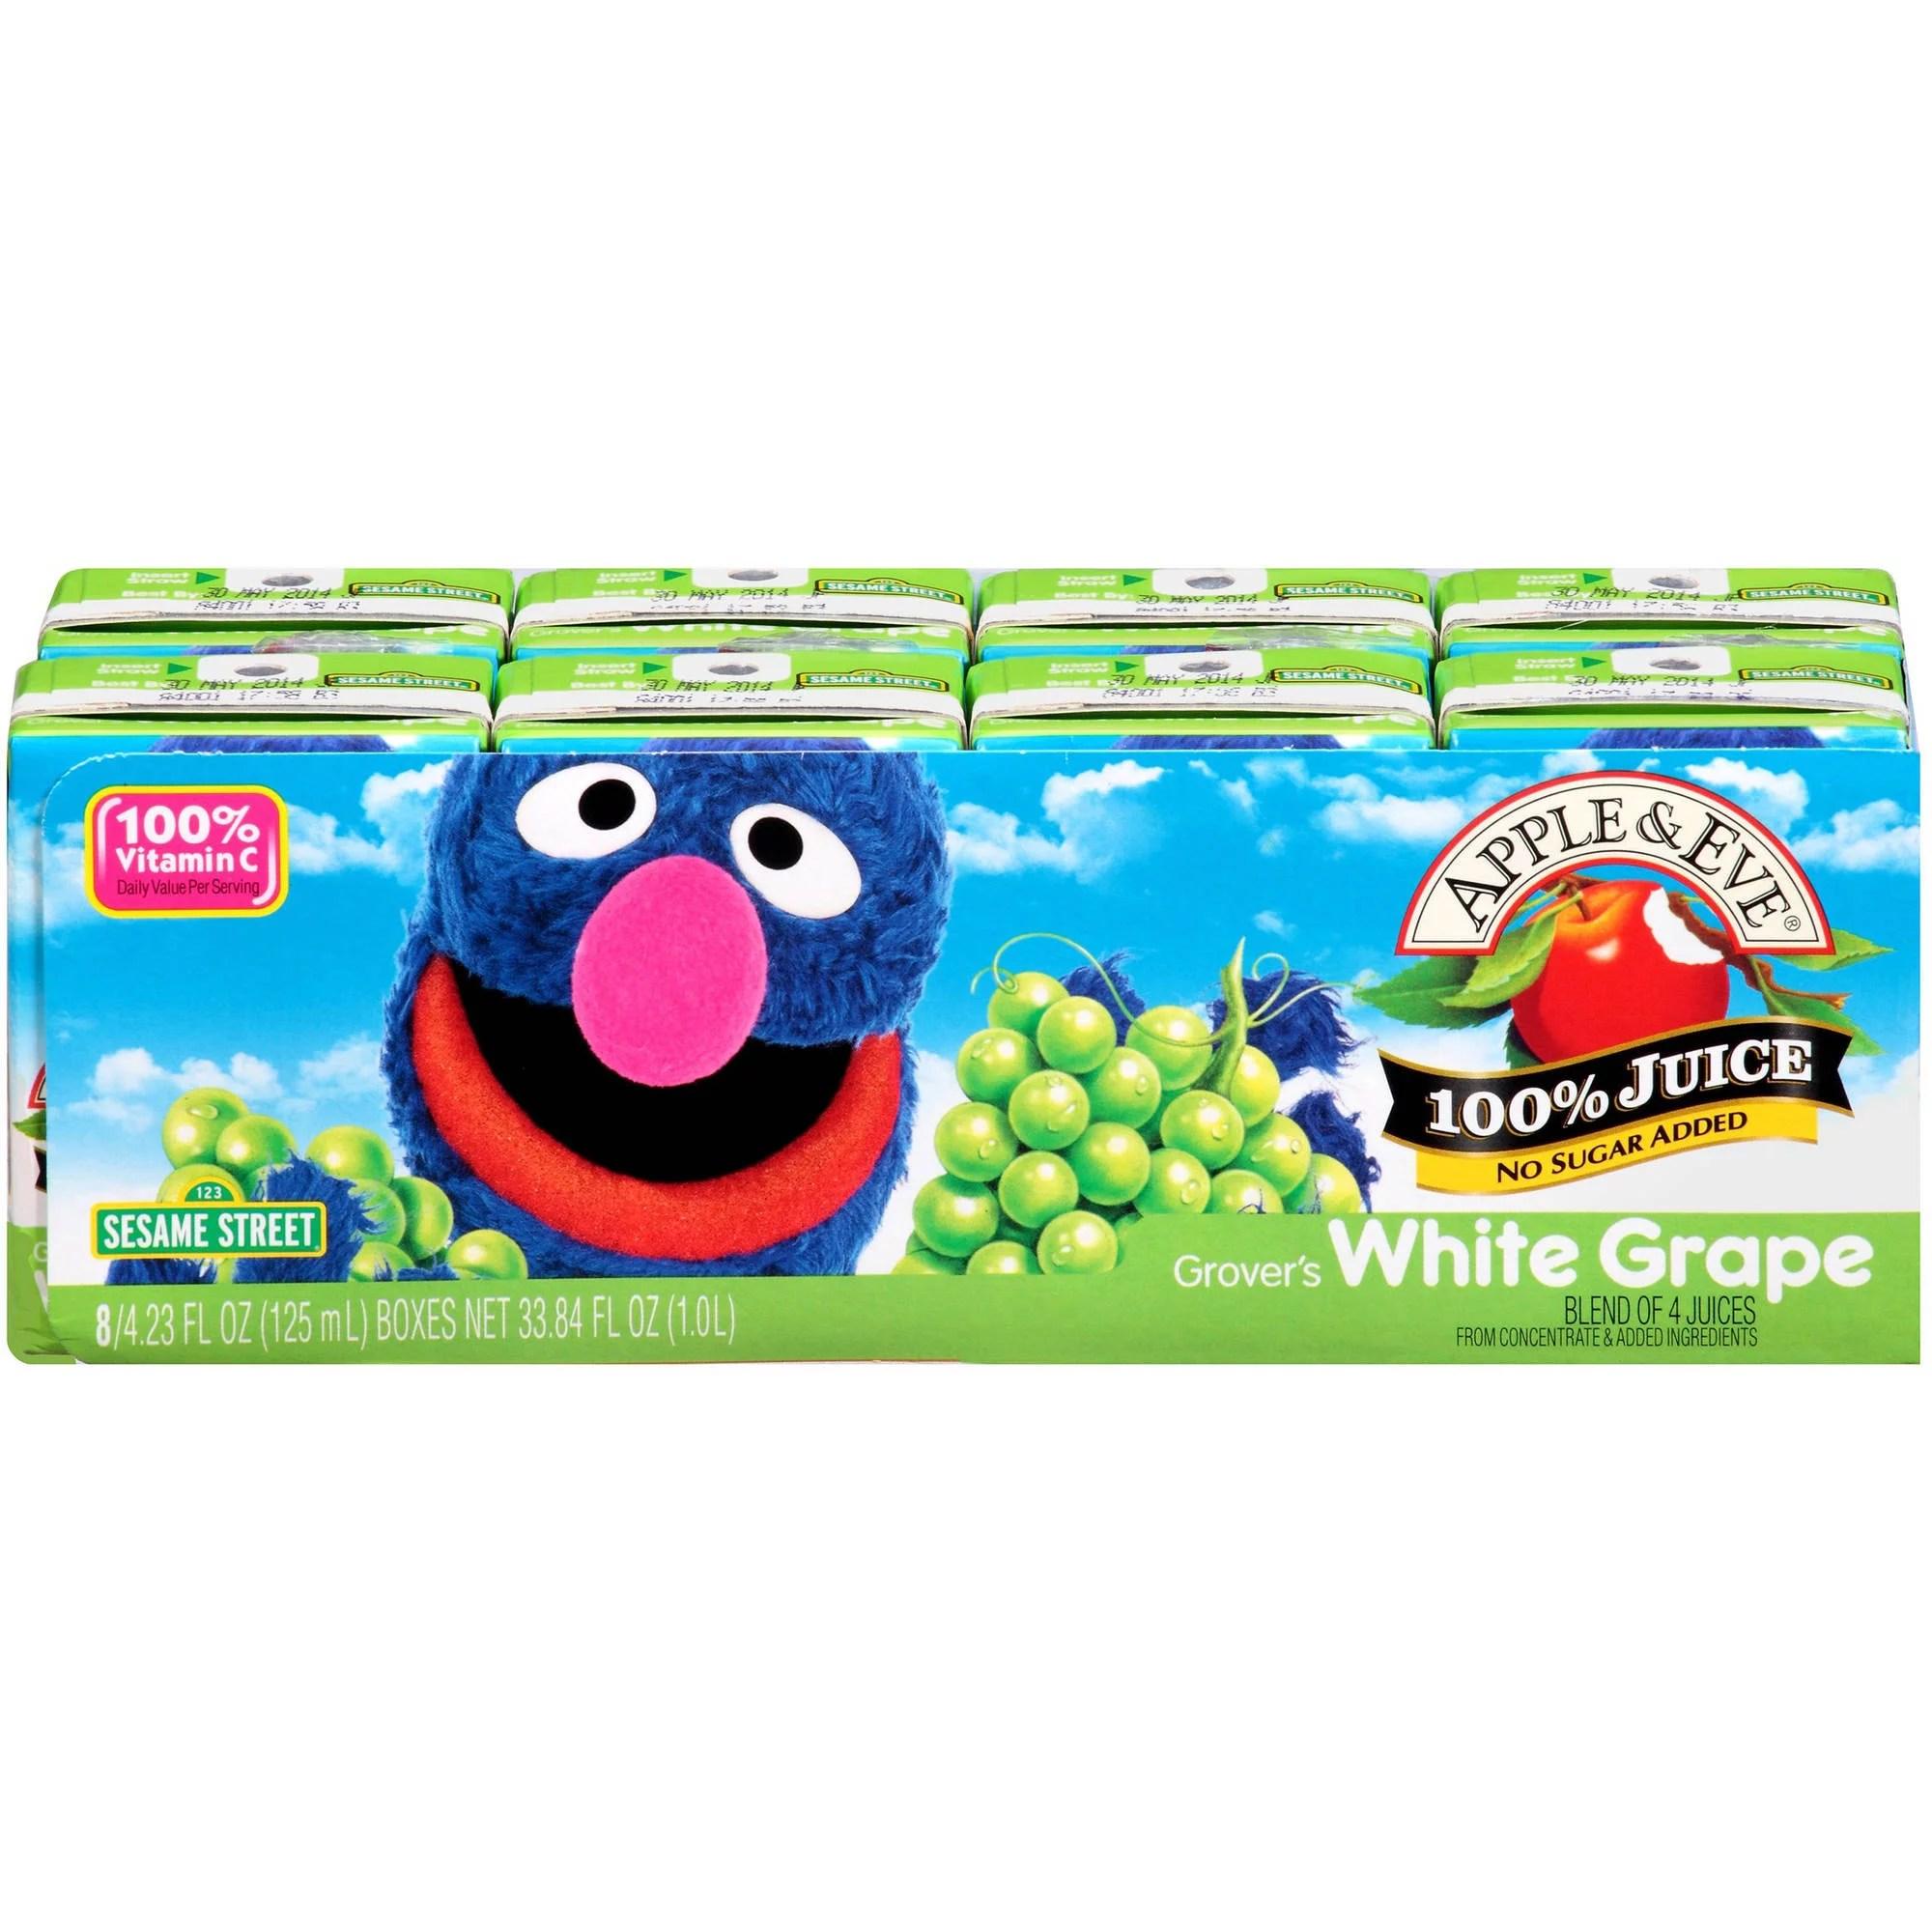 Apple Eve Sesame Street Grover39s White Grape Juice 423